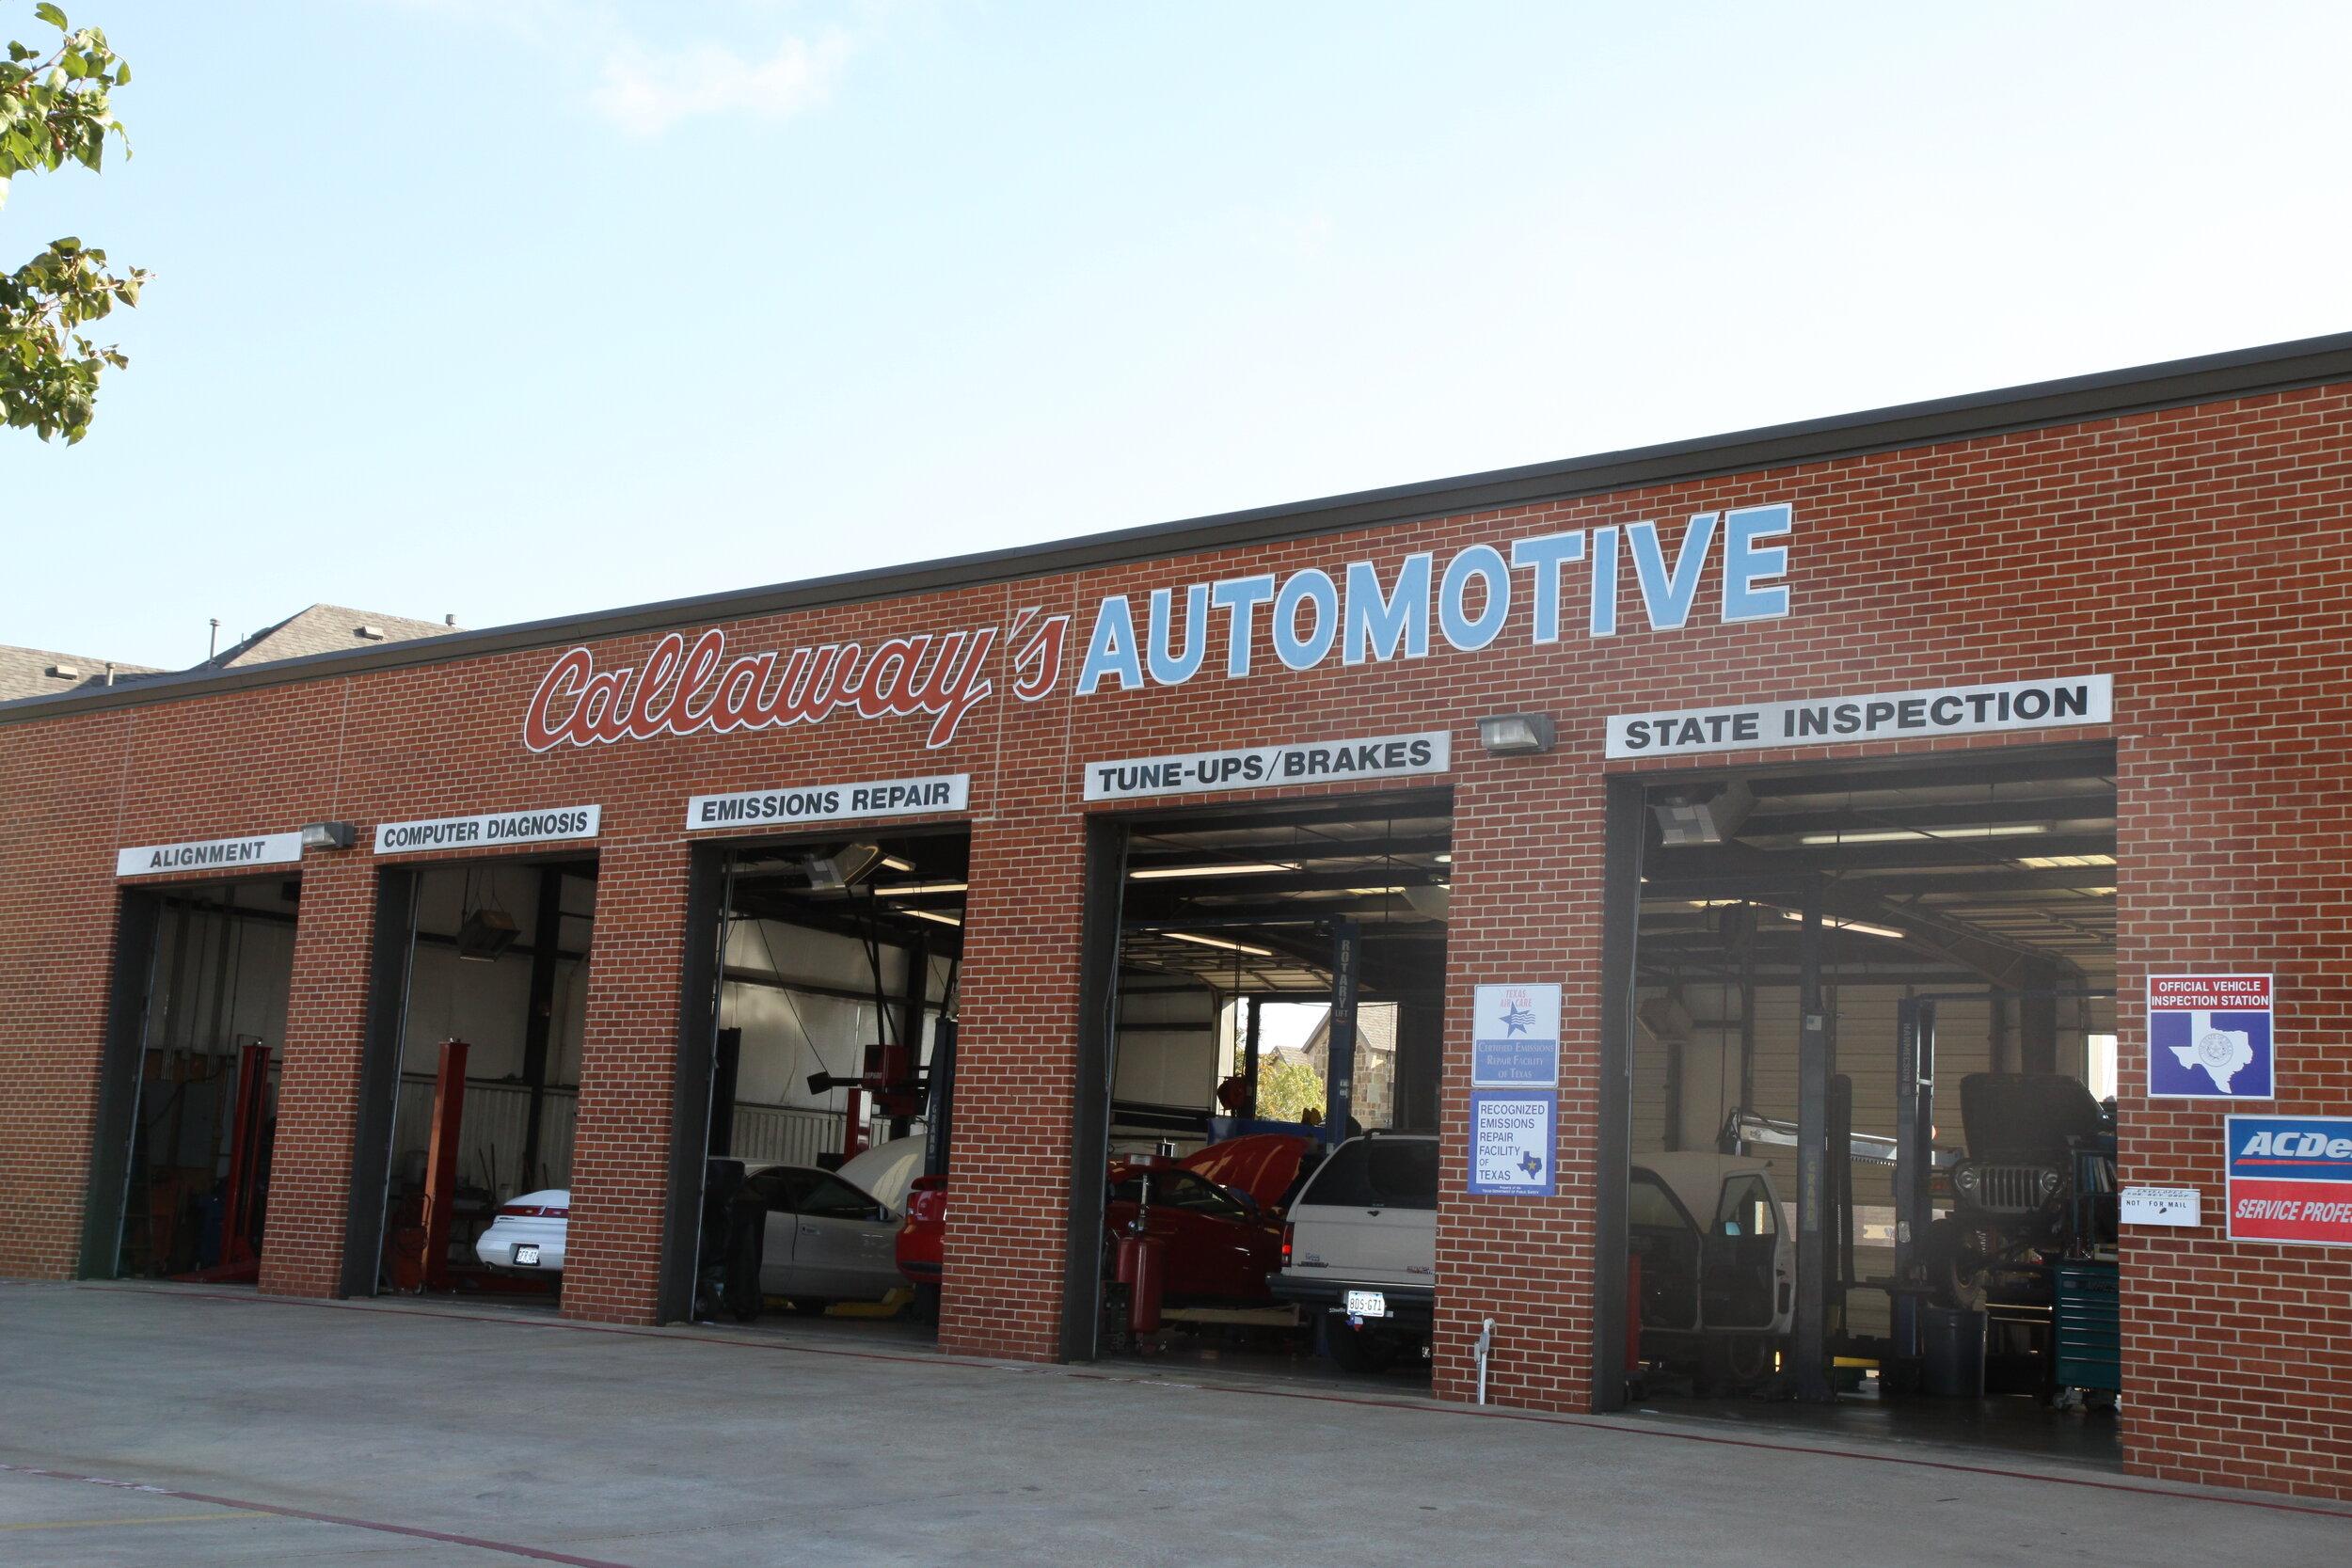 Callaway S Automotive Reviews Auto Repair Shop North Richland Hills Callaway S